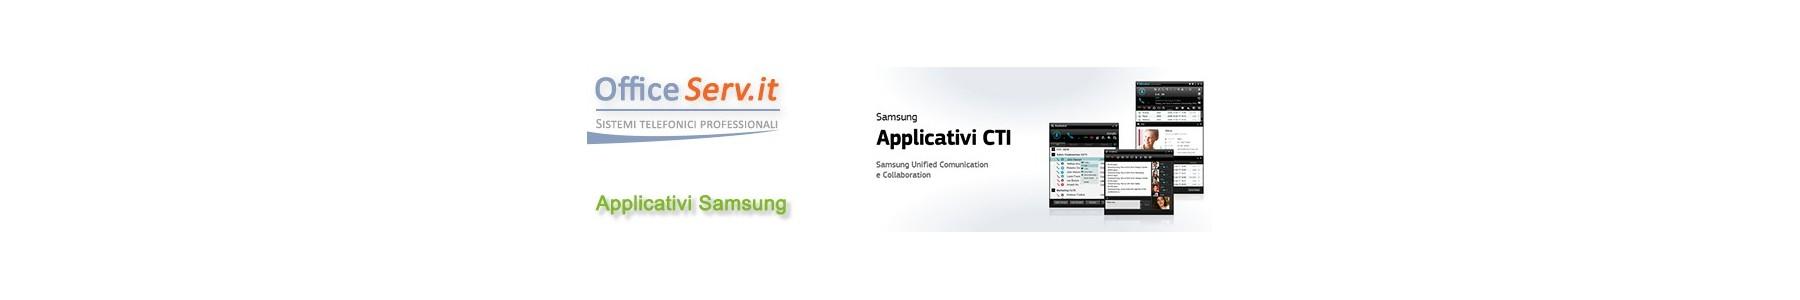 Applicativi Samsung